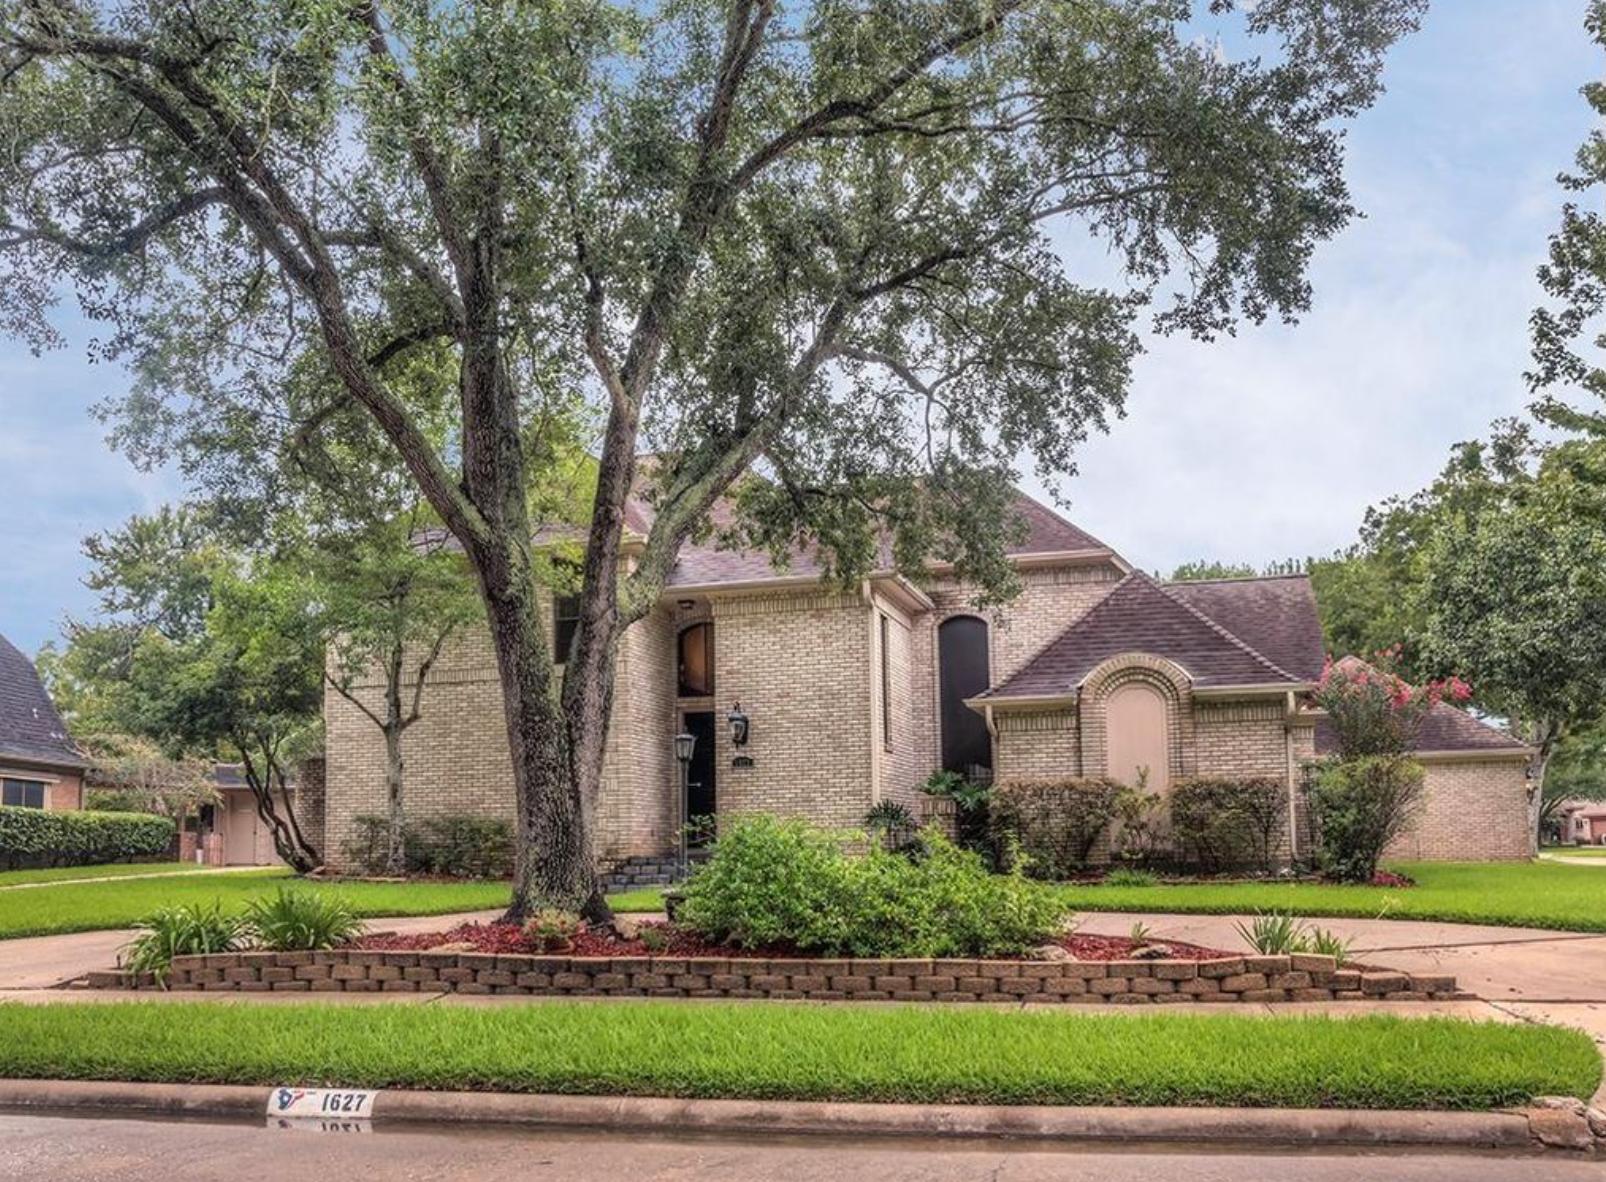 Richmond, Texas (Houston-The Woodlands-Sugar Land, TX); list price: $299,900; square footage: 2,850; beds/baths: 4/2.5